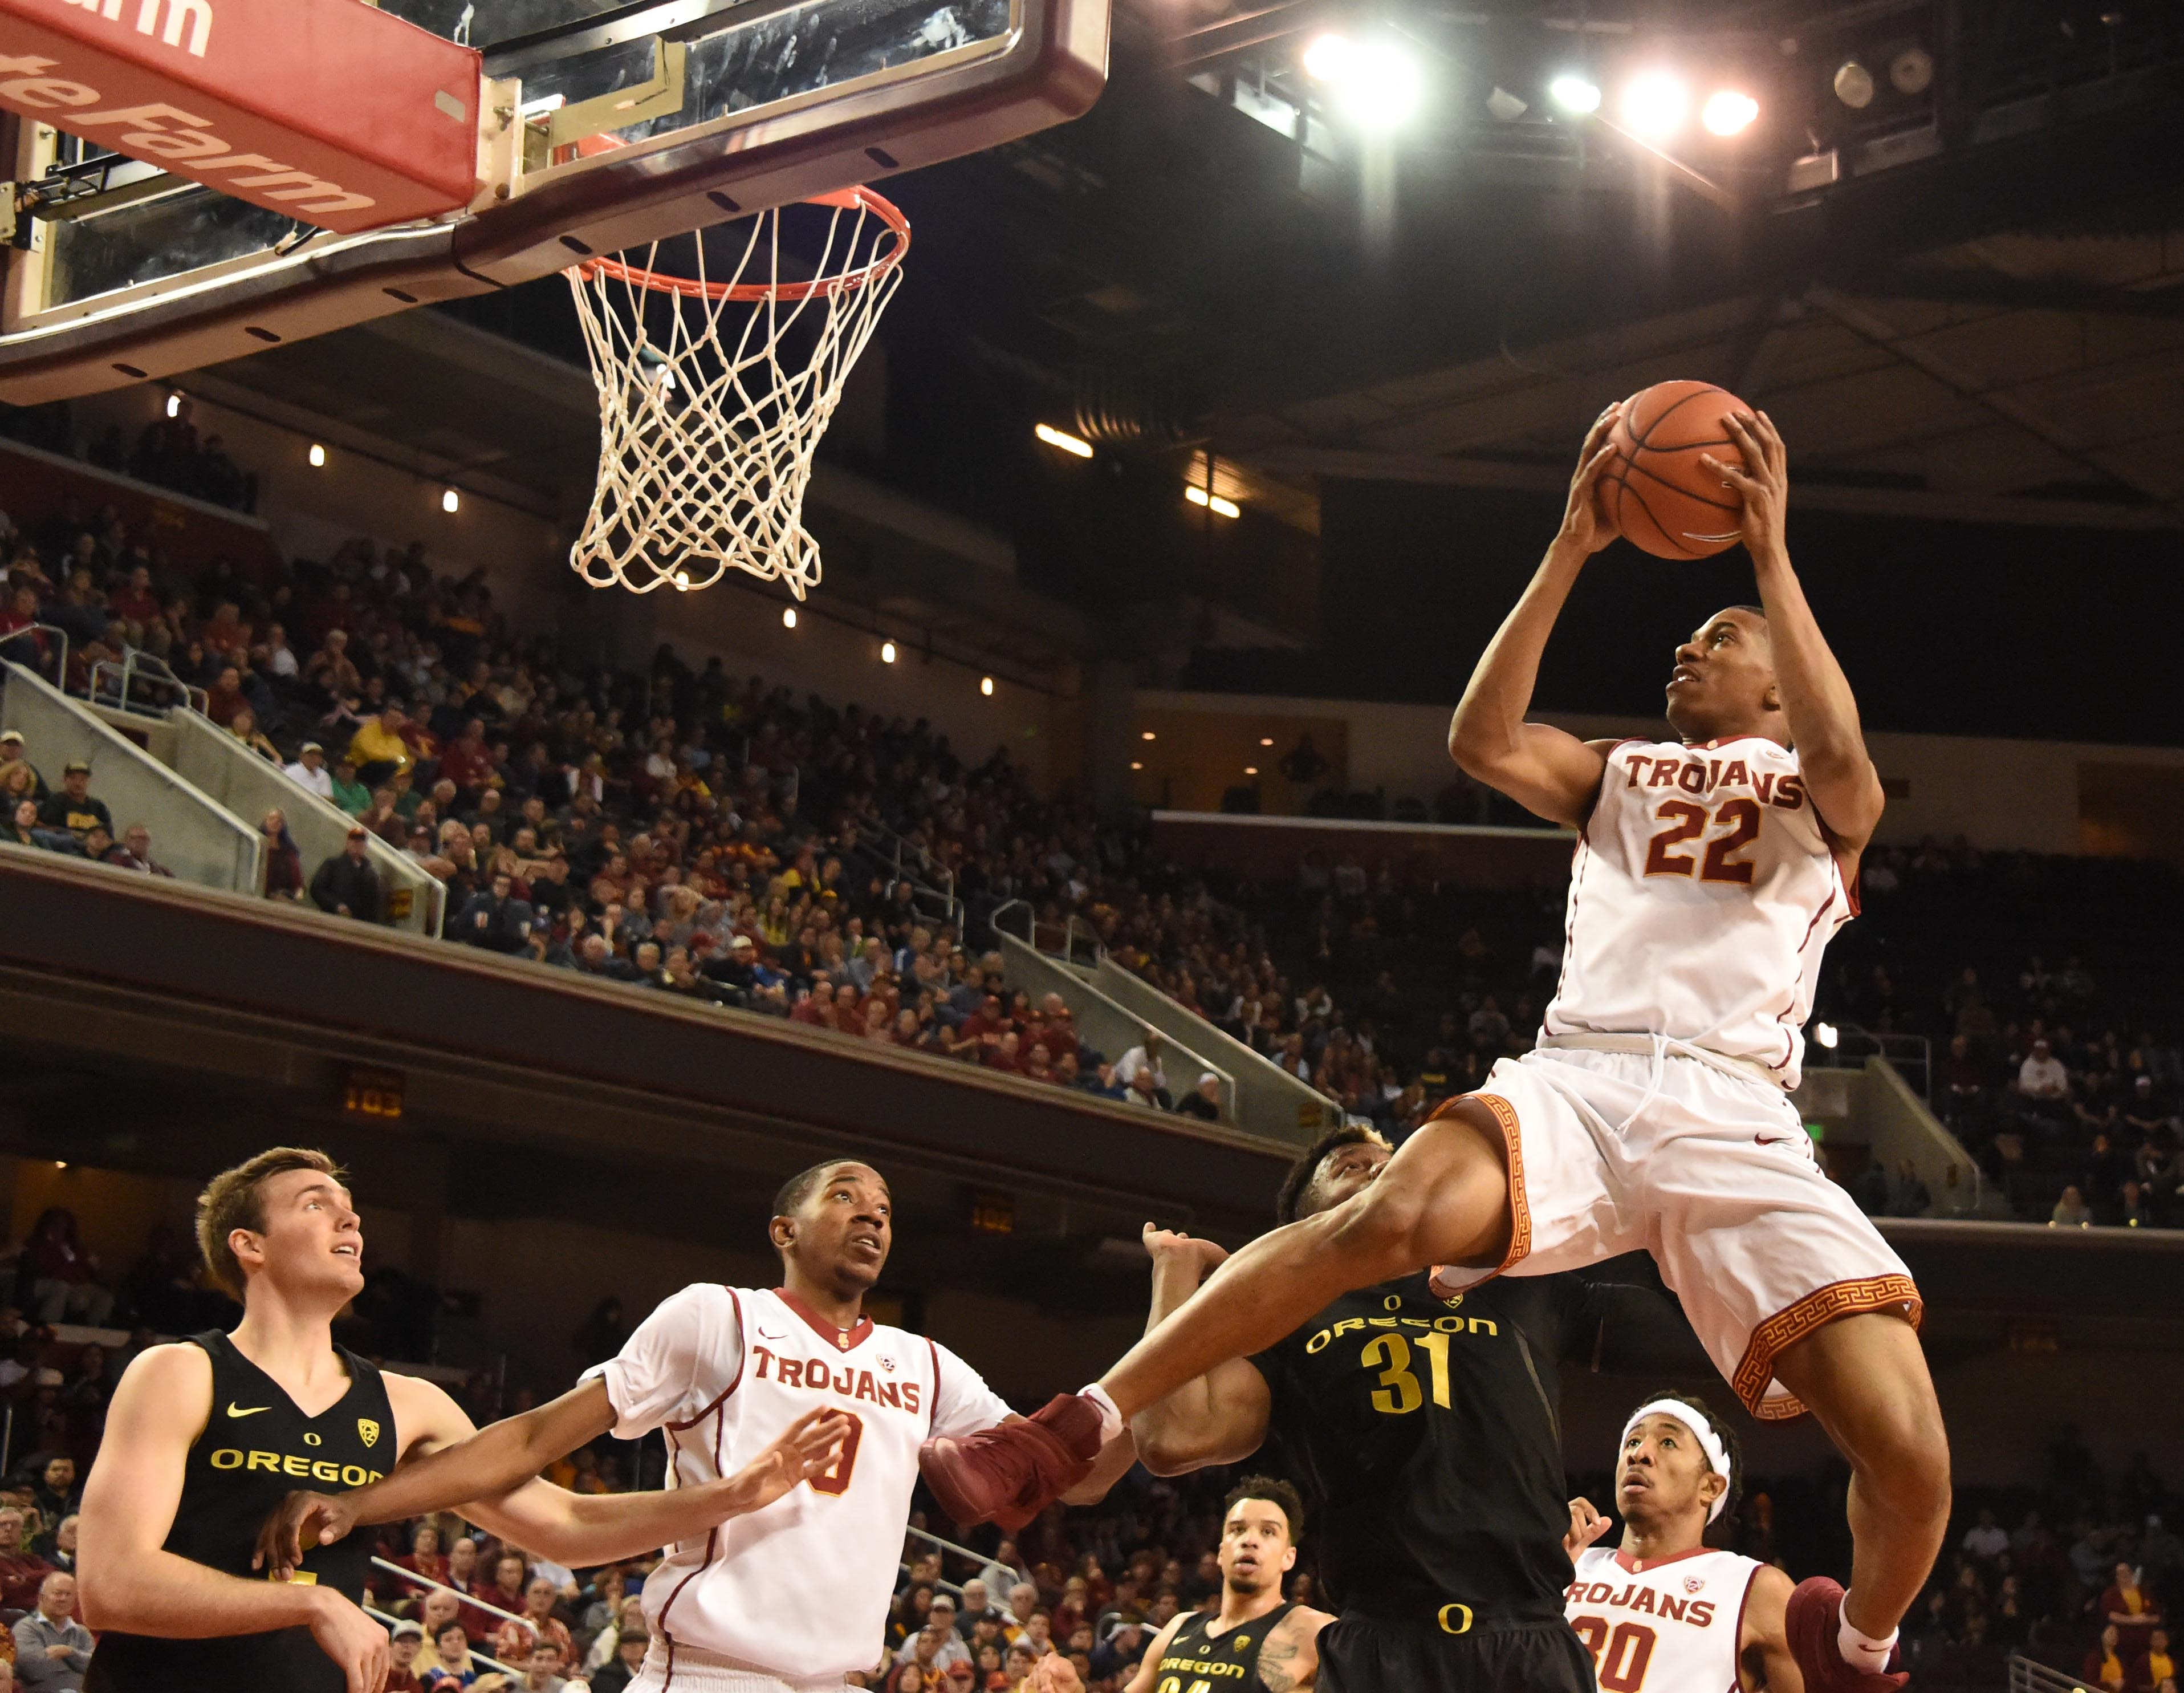 USC Basketball Bracketology: Trojans Average No. 7 Seed (2/17)